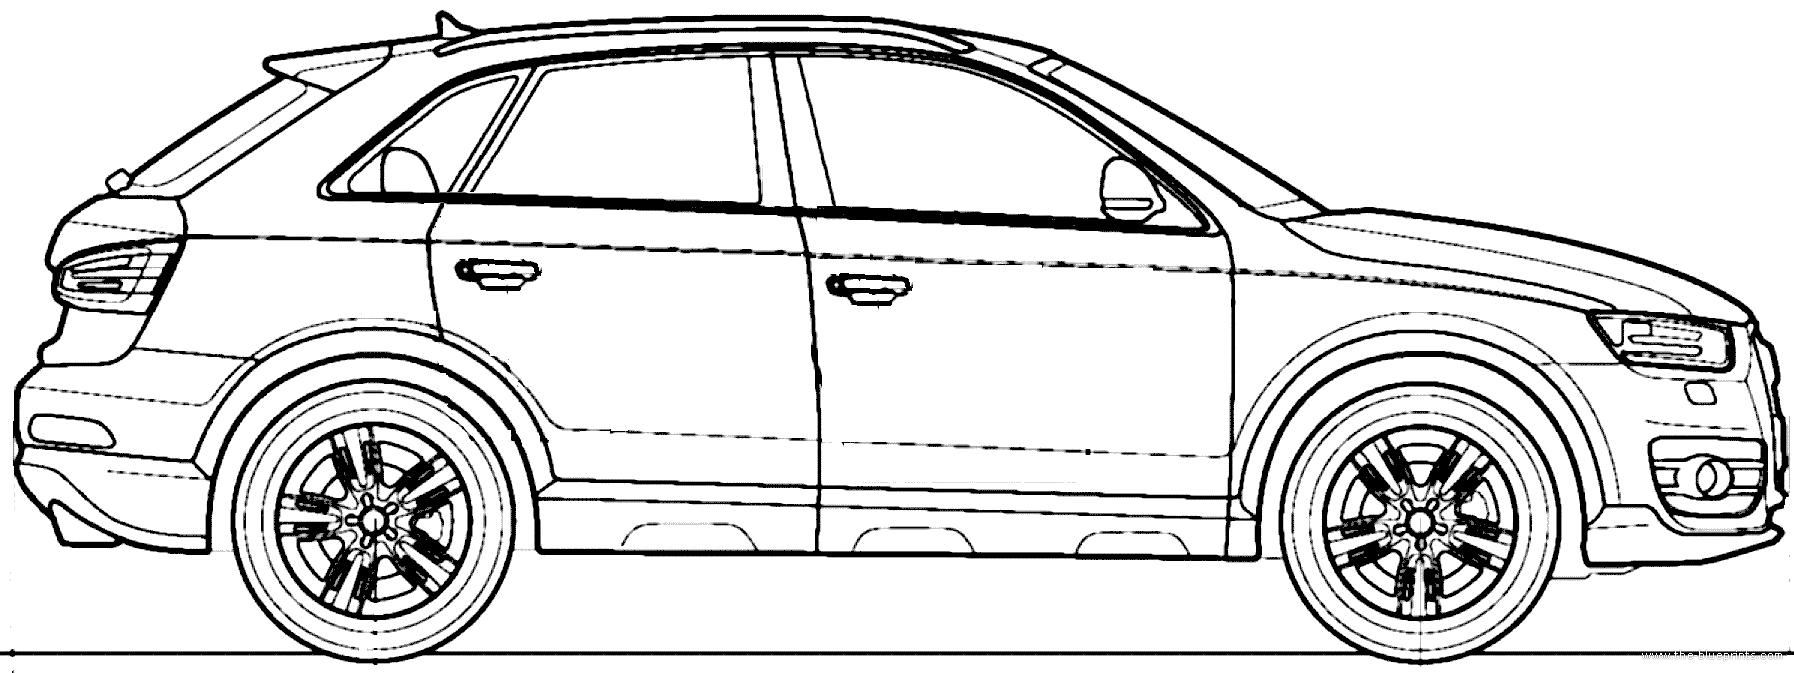 Blueprints > Cars > Audi > Audi Q3 (2014)